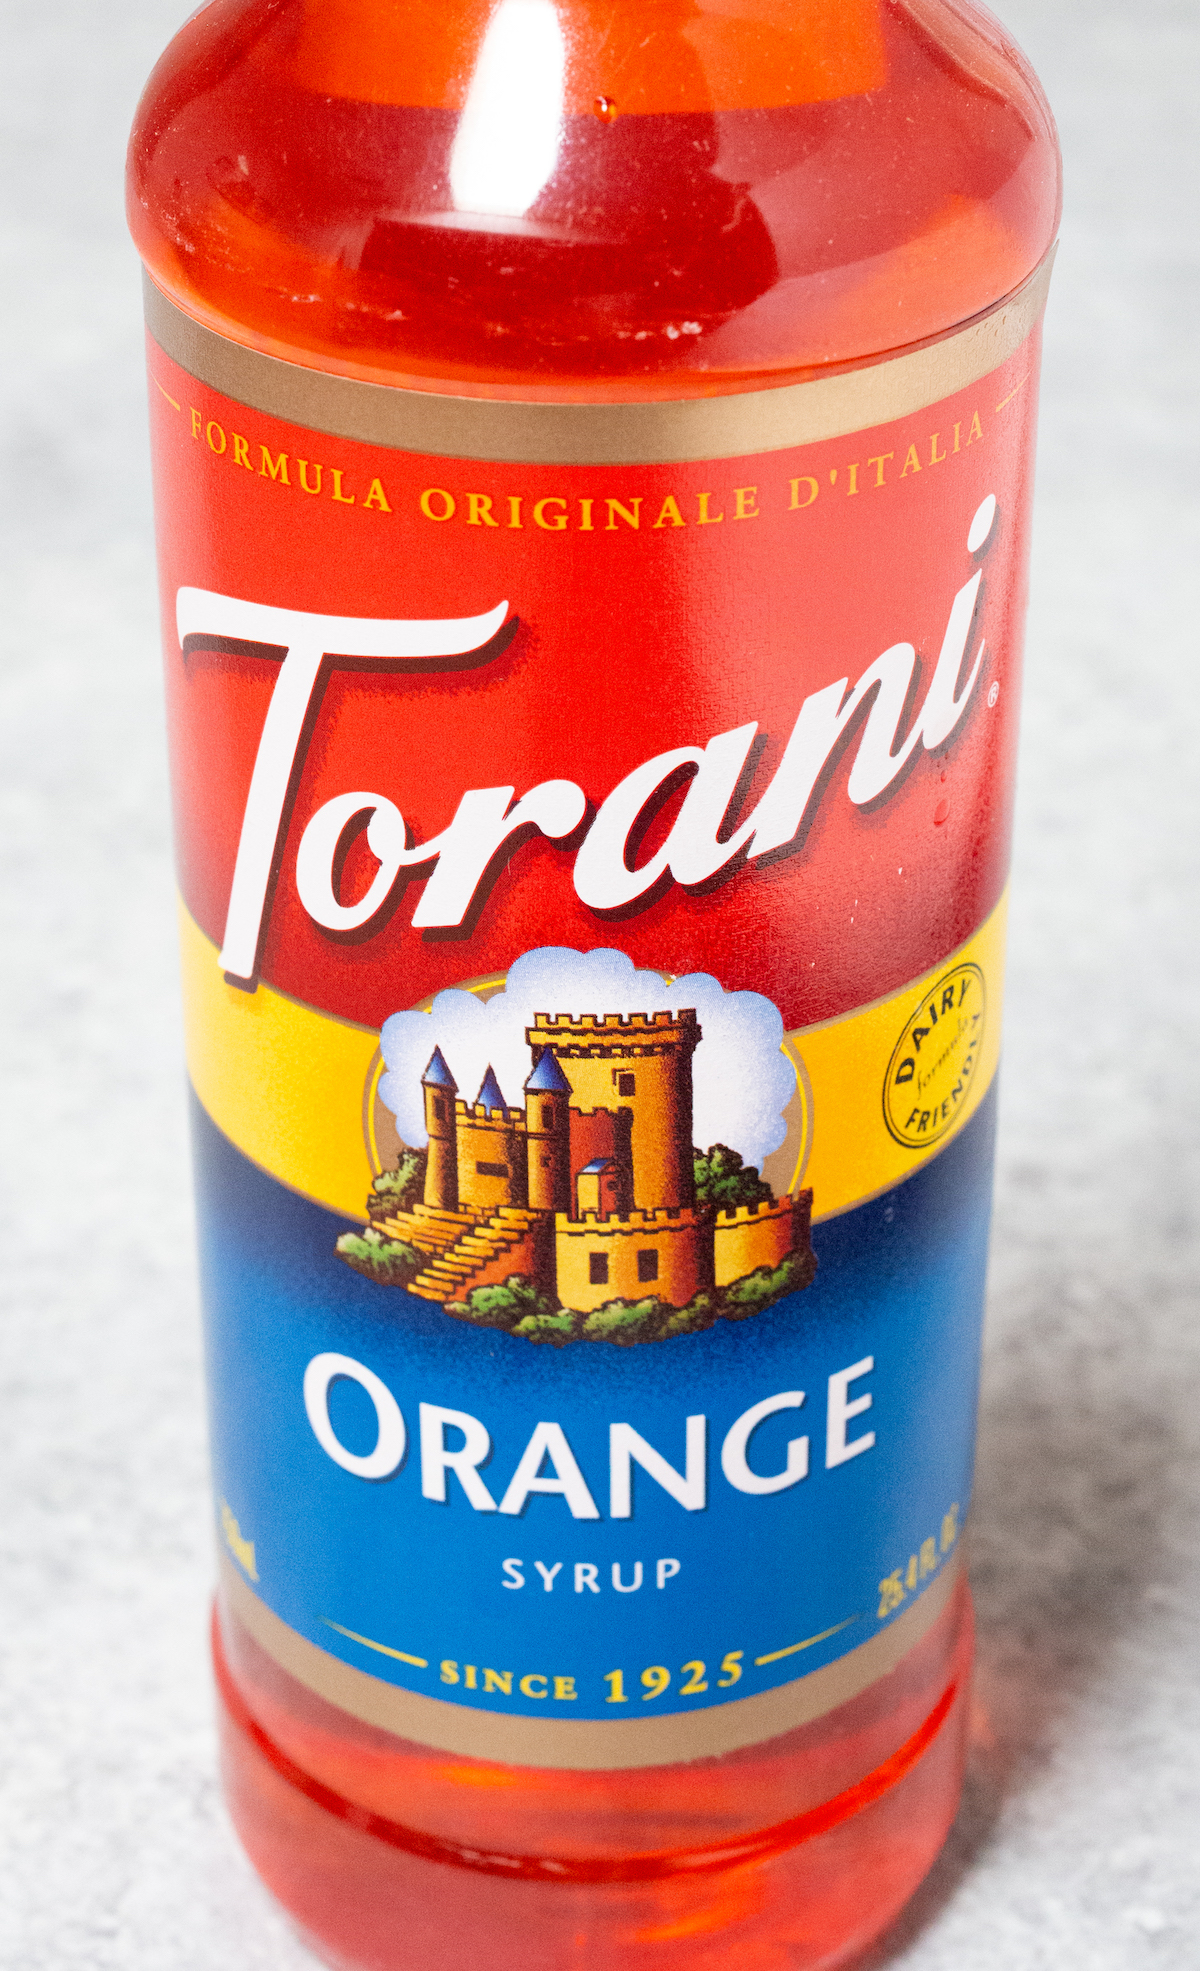 A bottle of Torani Orange Syrup on a light background.